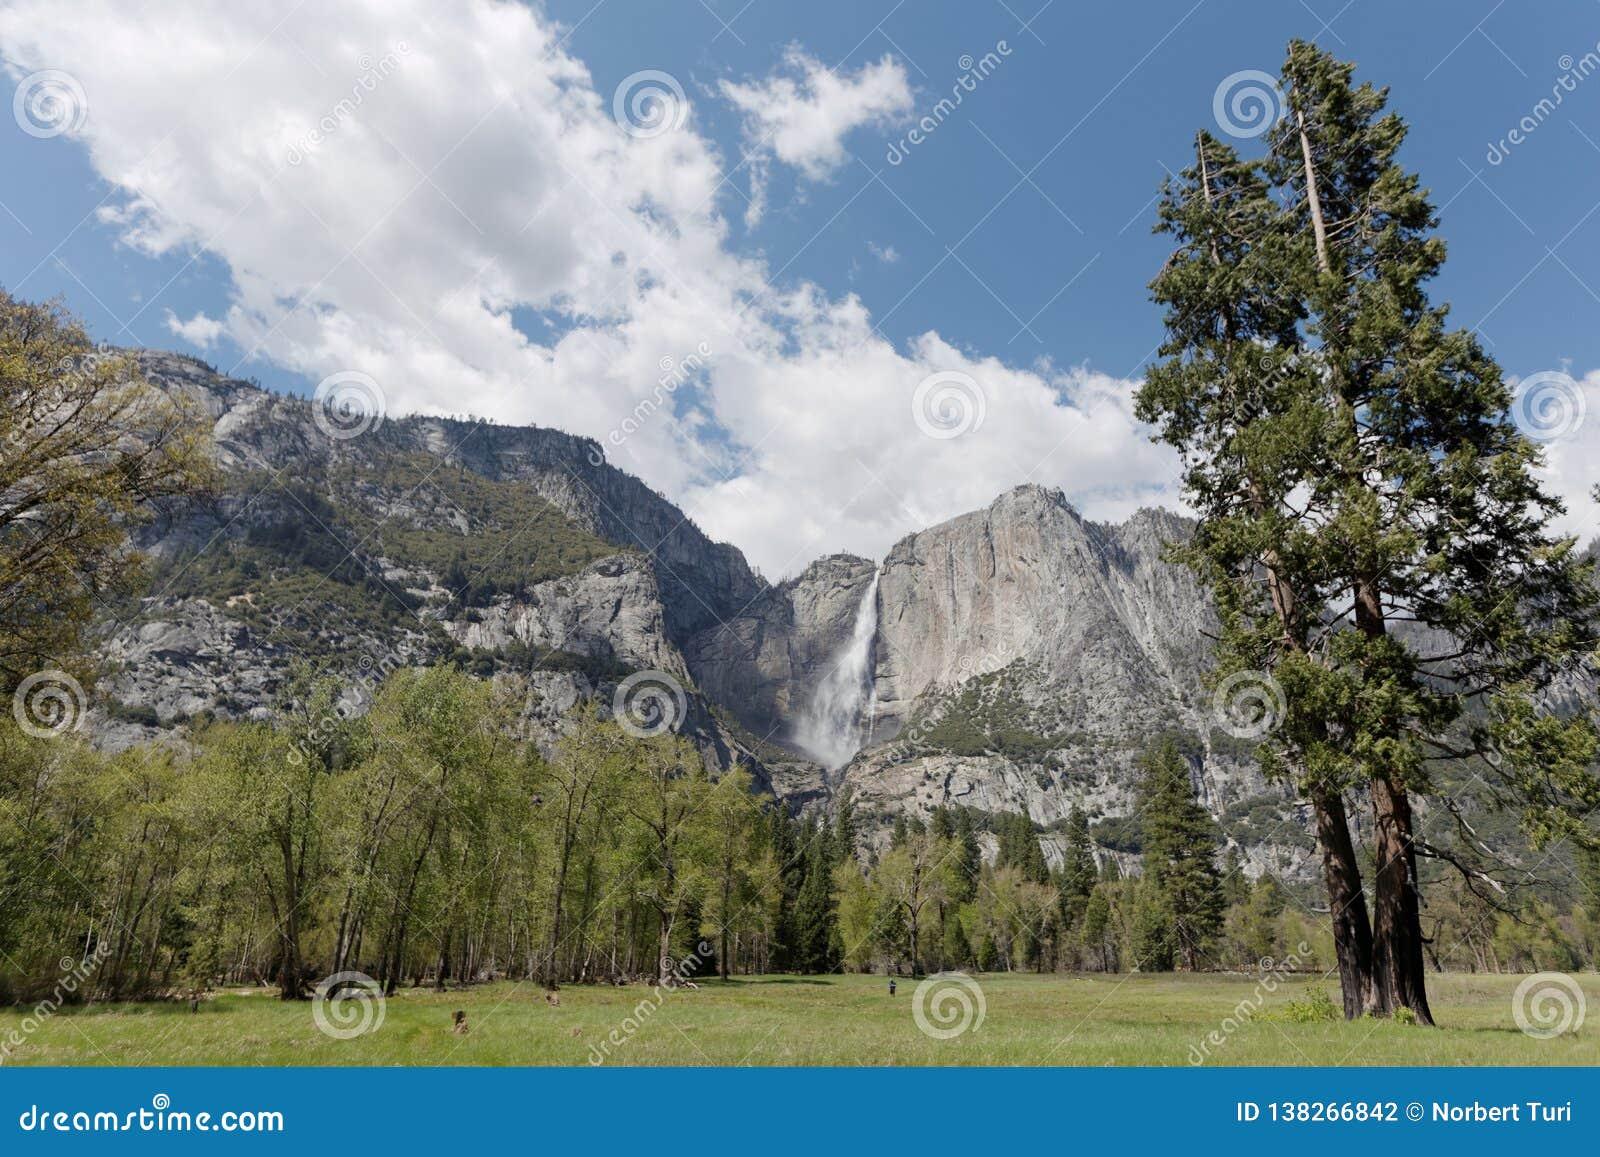 El Capitan and waterfall in Yosemite